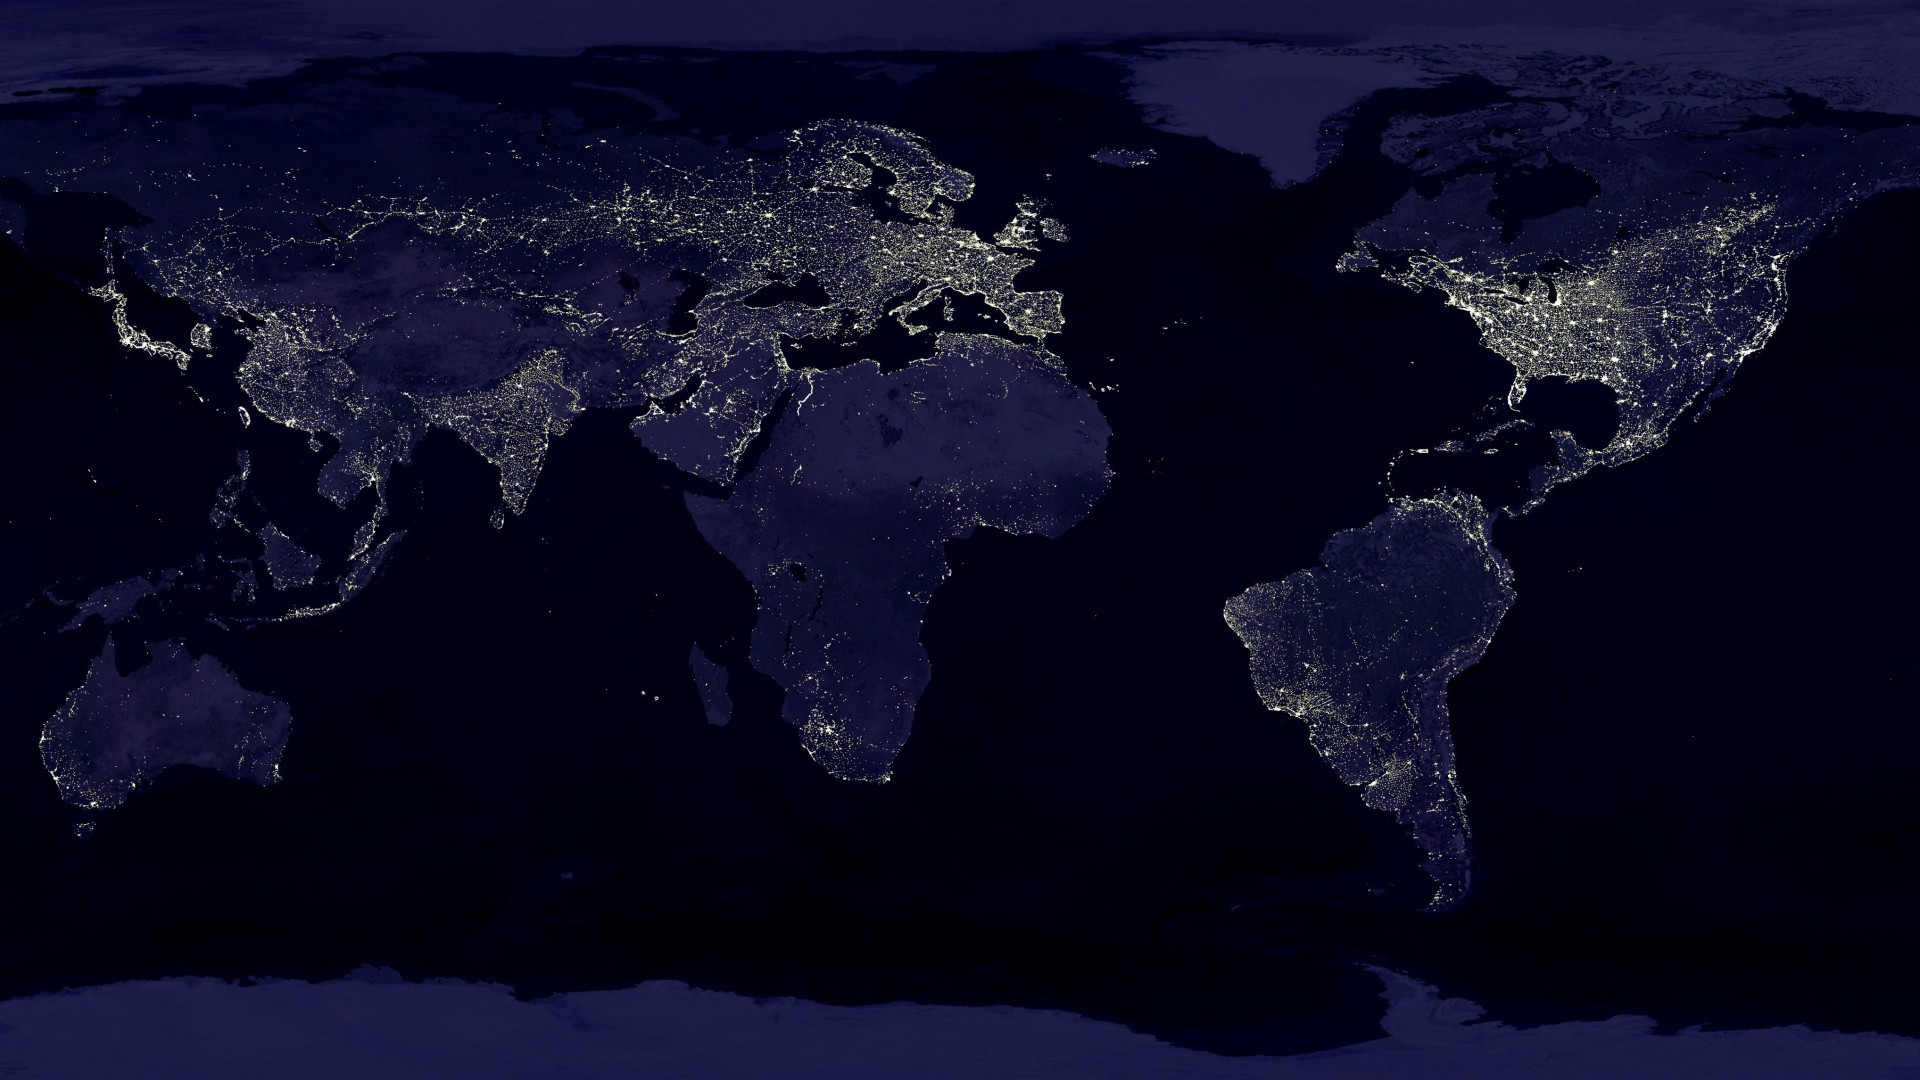 Earth at Night Wallpaper HD - WallpaperSafari